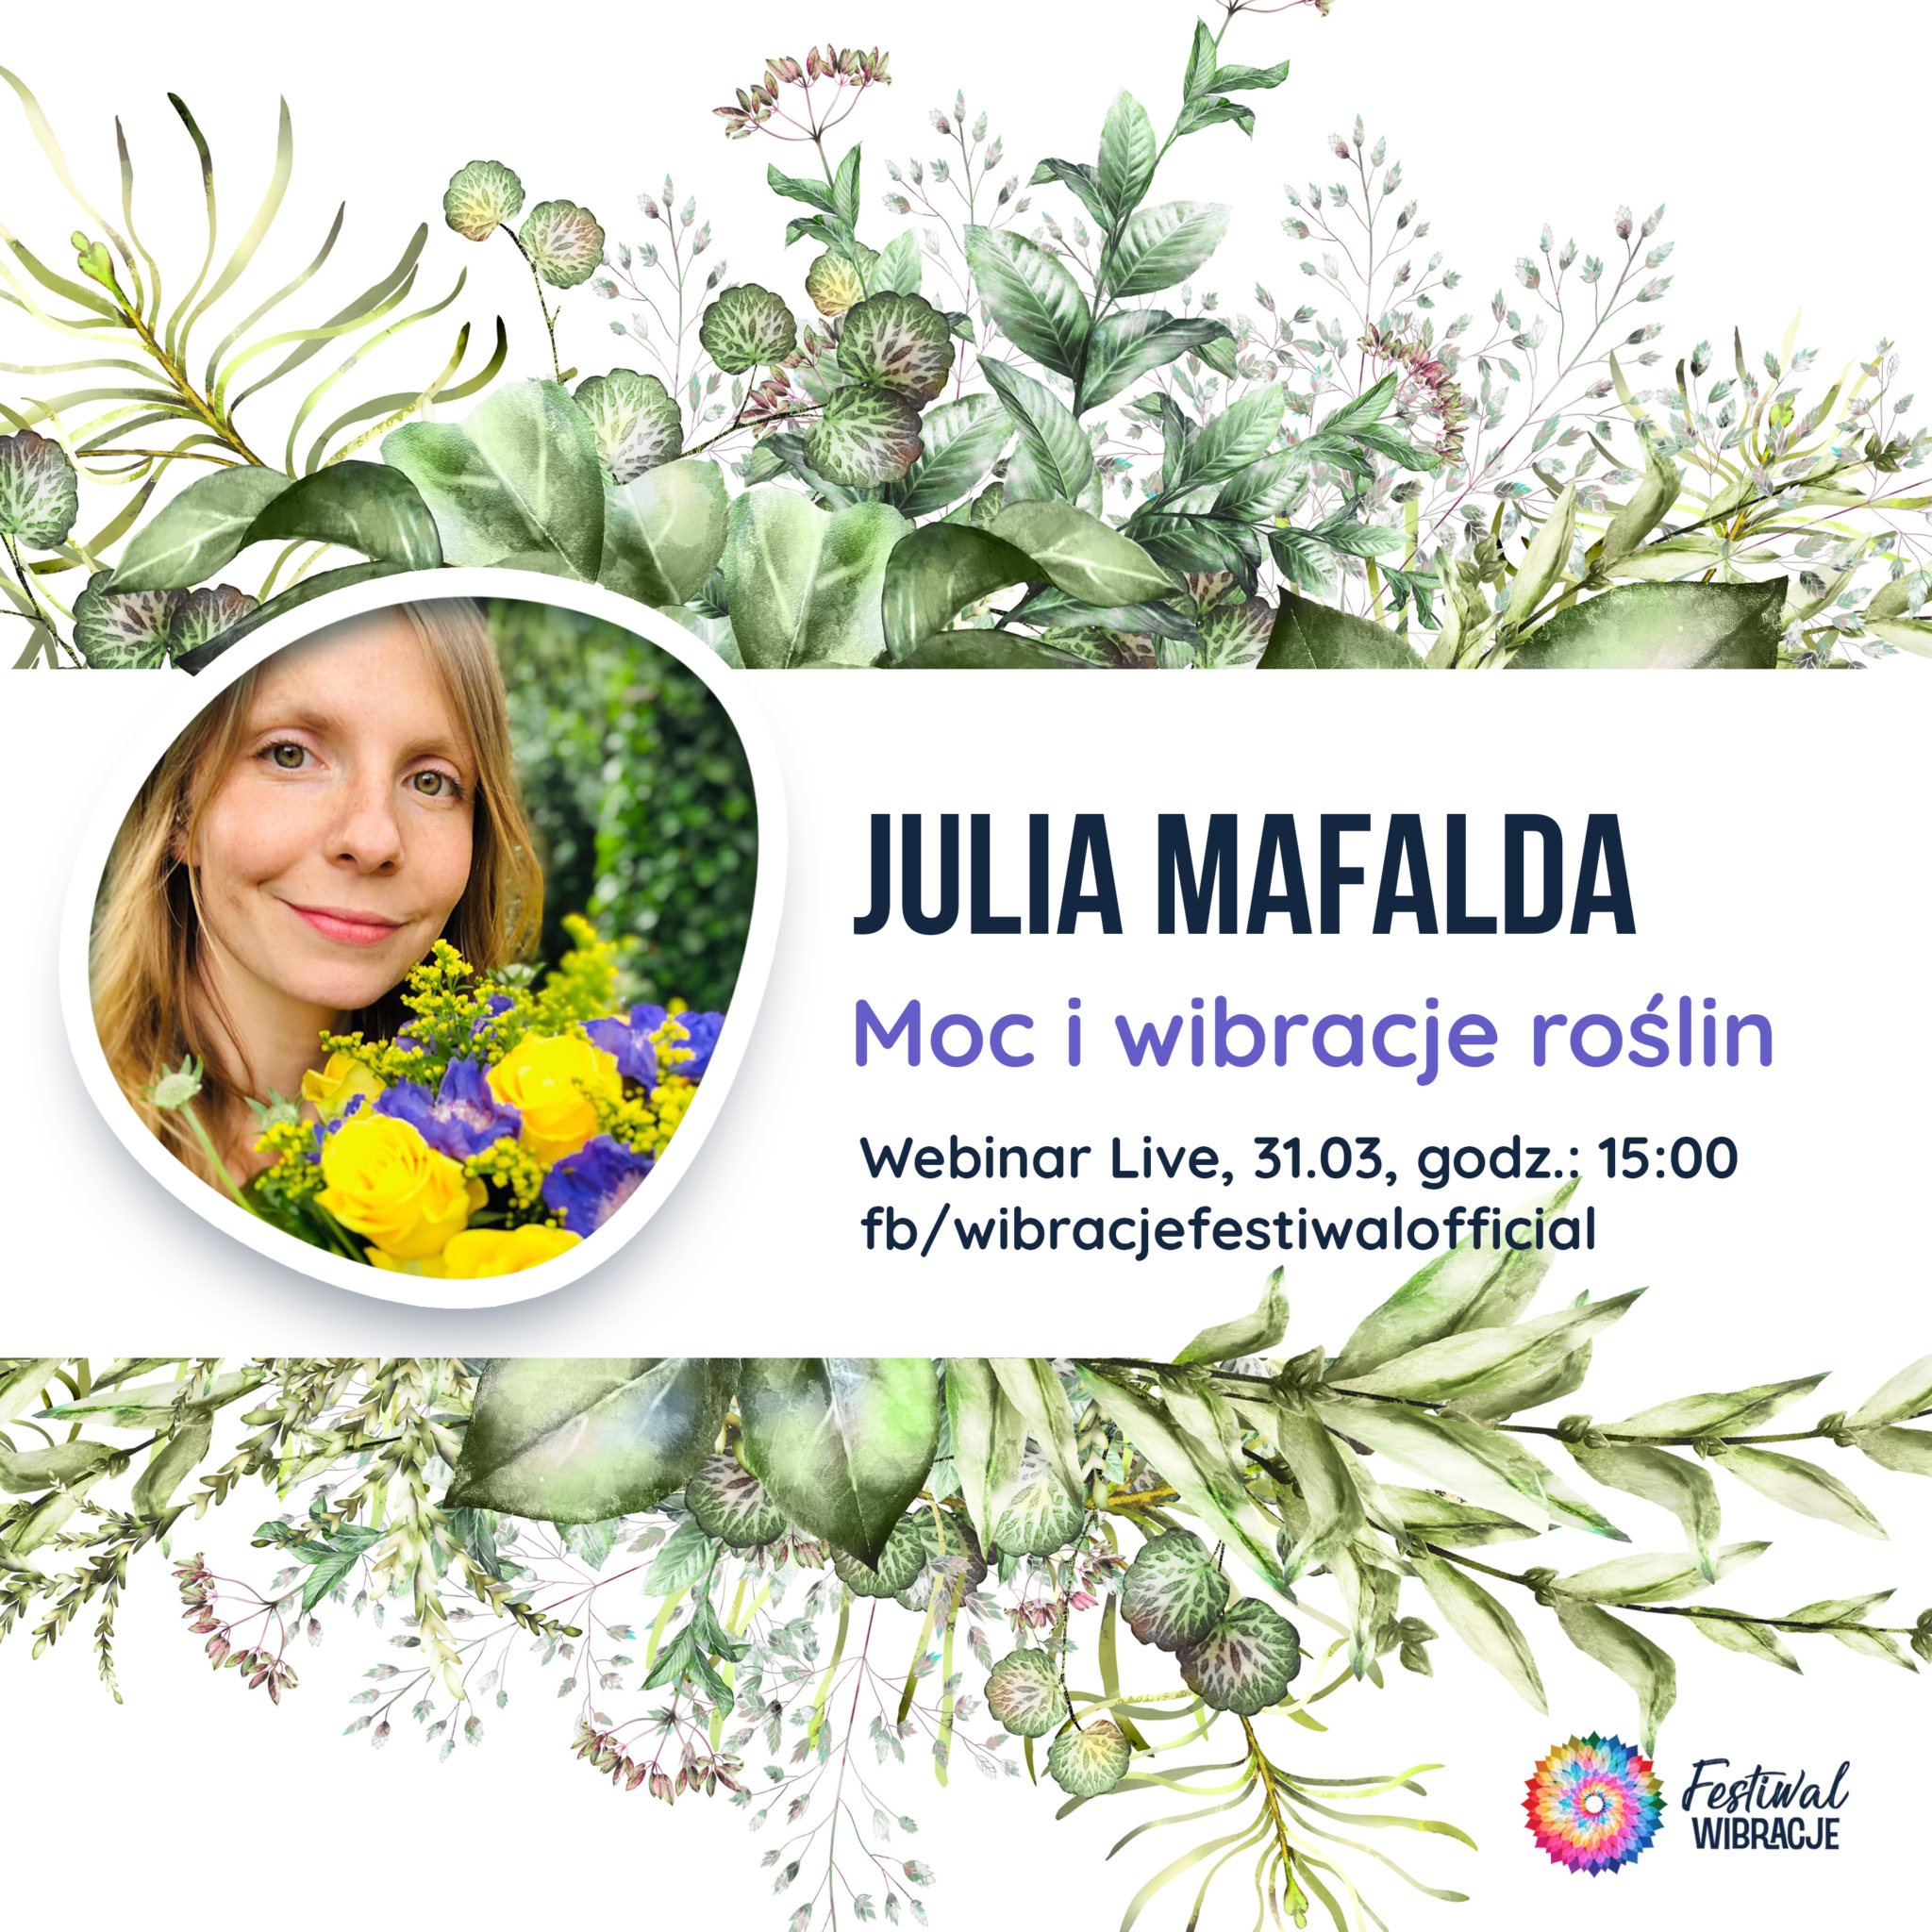 Julia Mafalda – Moc i wibracje roślin – webinar